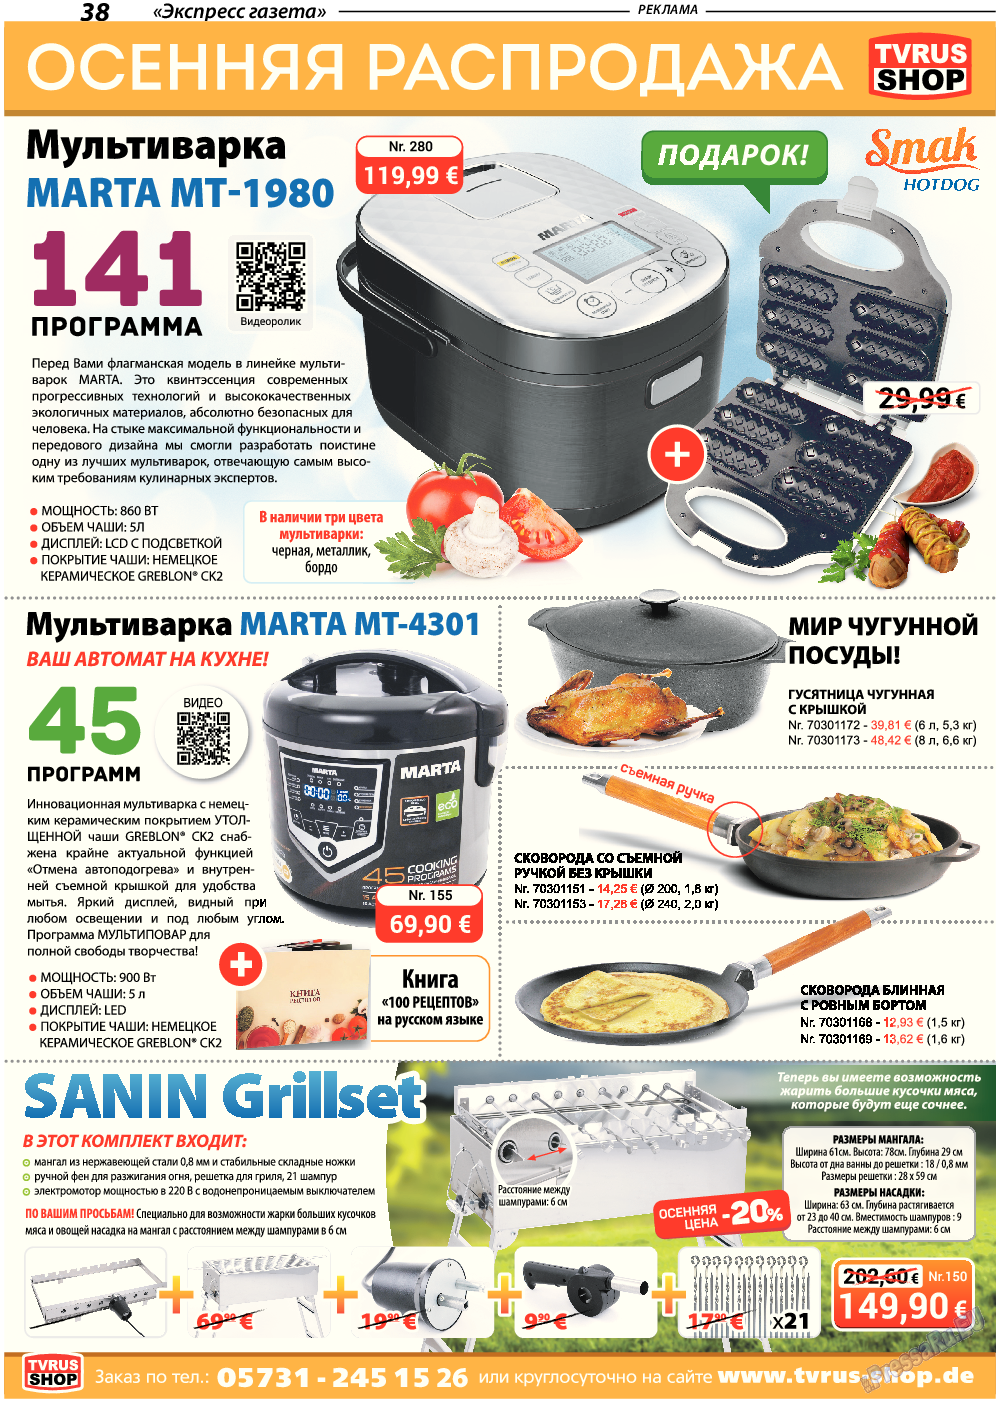 Экспресс газета (газета). 2016 год, номер 11, стр. 38